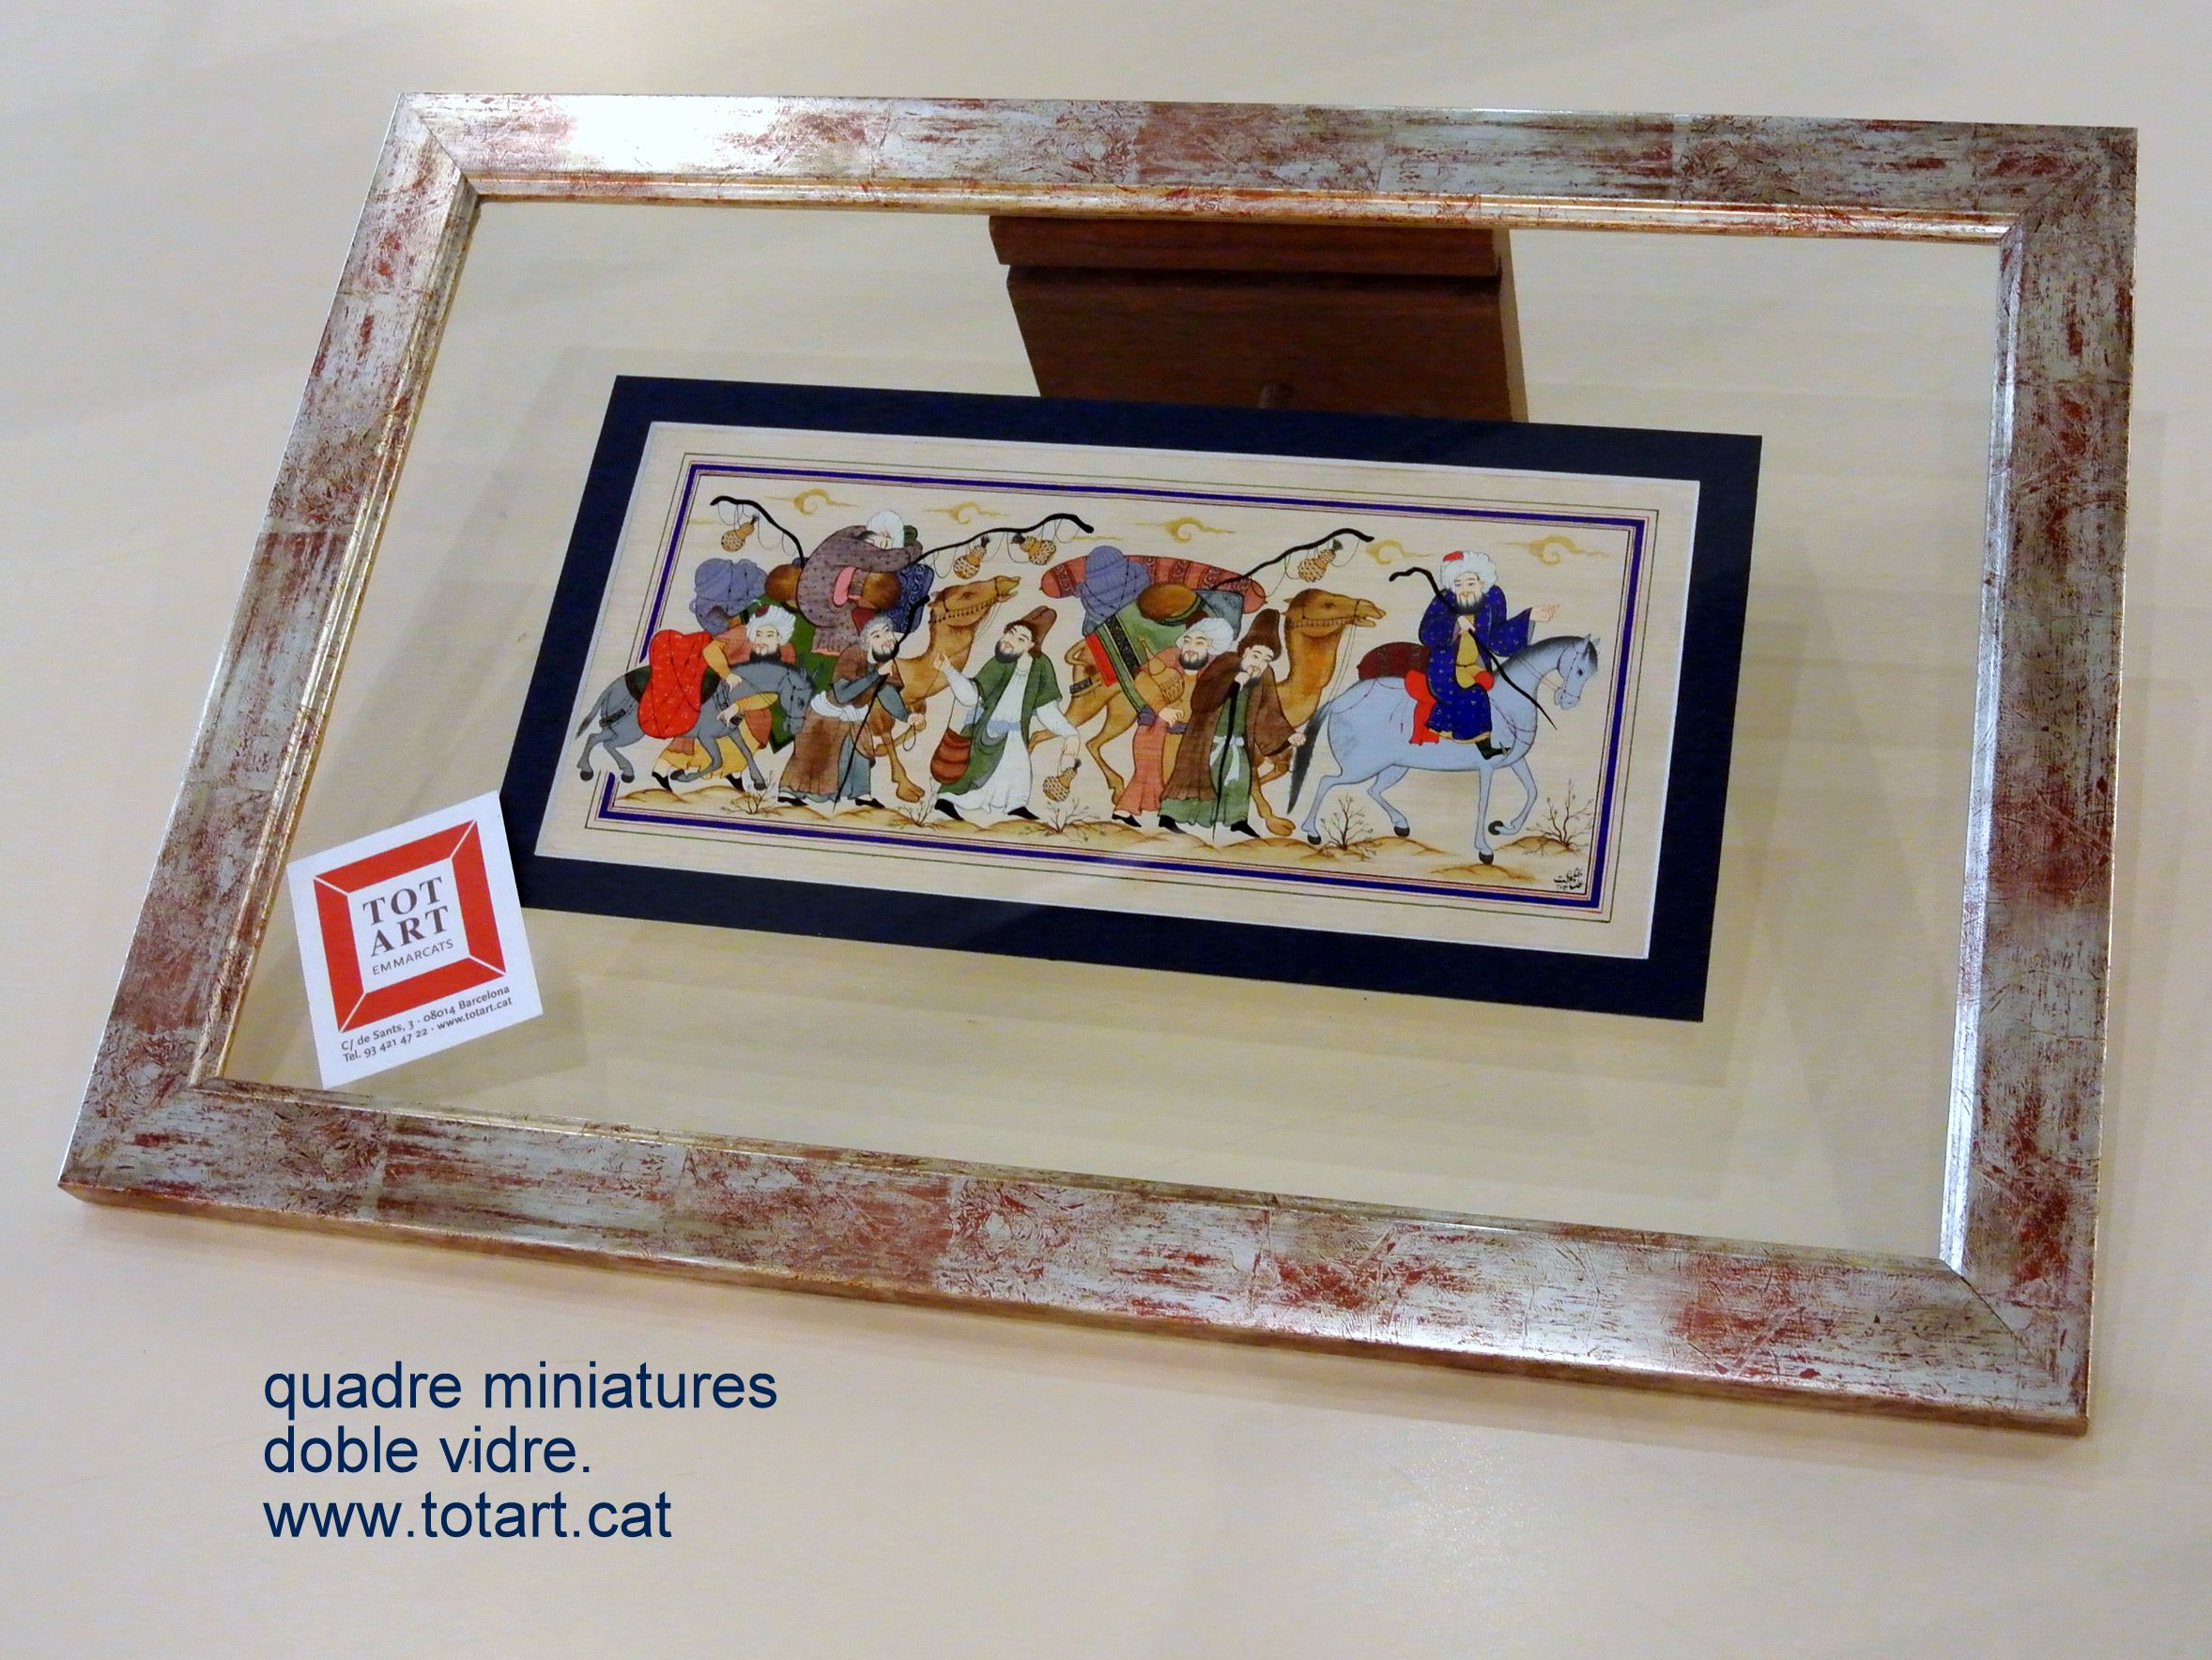 Fotos enmarcadas decoracion bastidores para tus lminas a for Enmarcar cuadros en casa